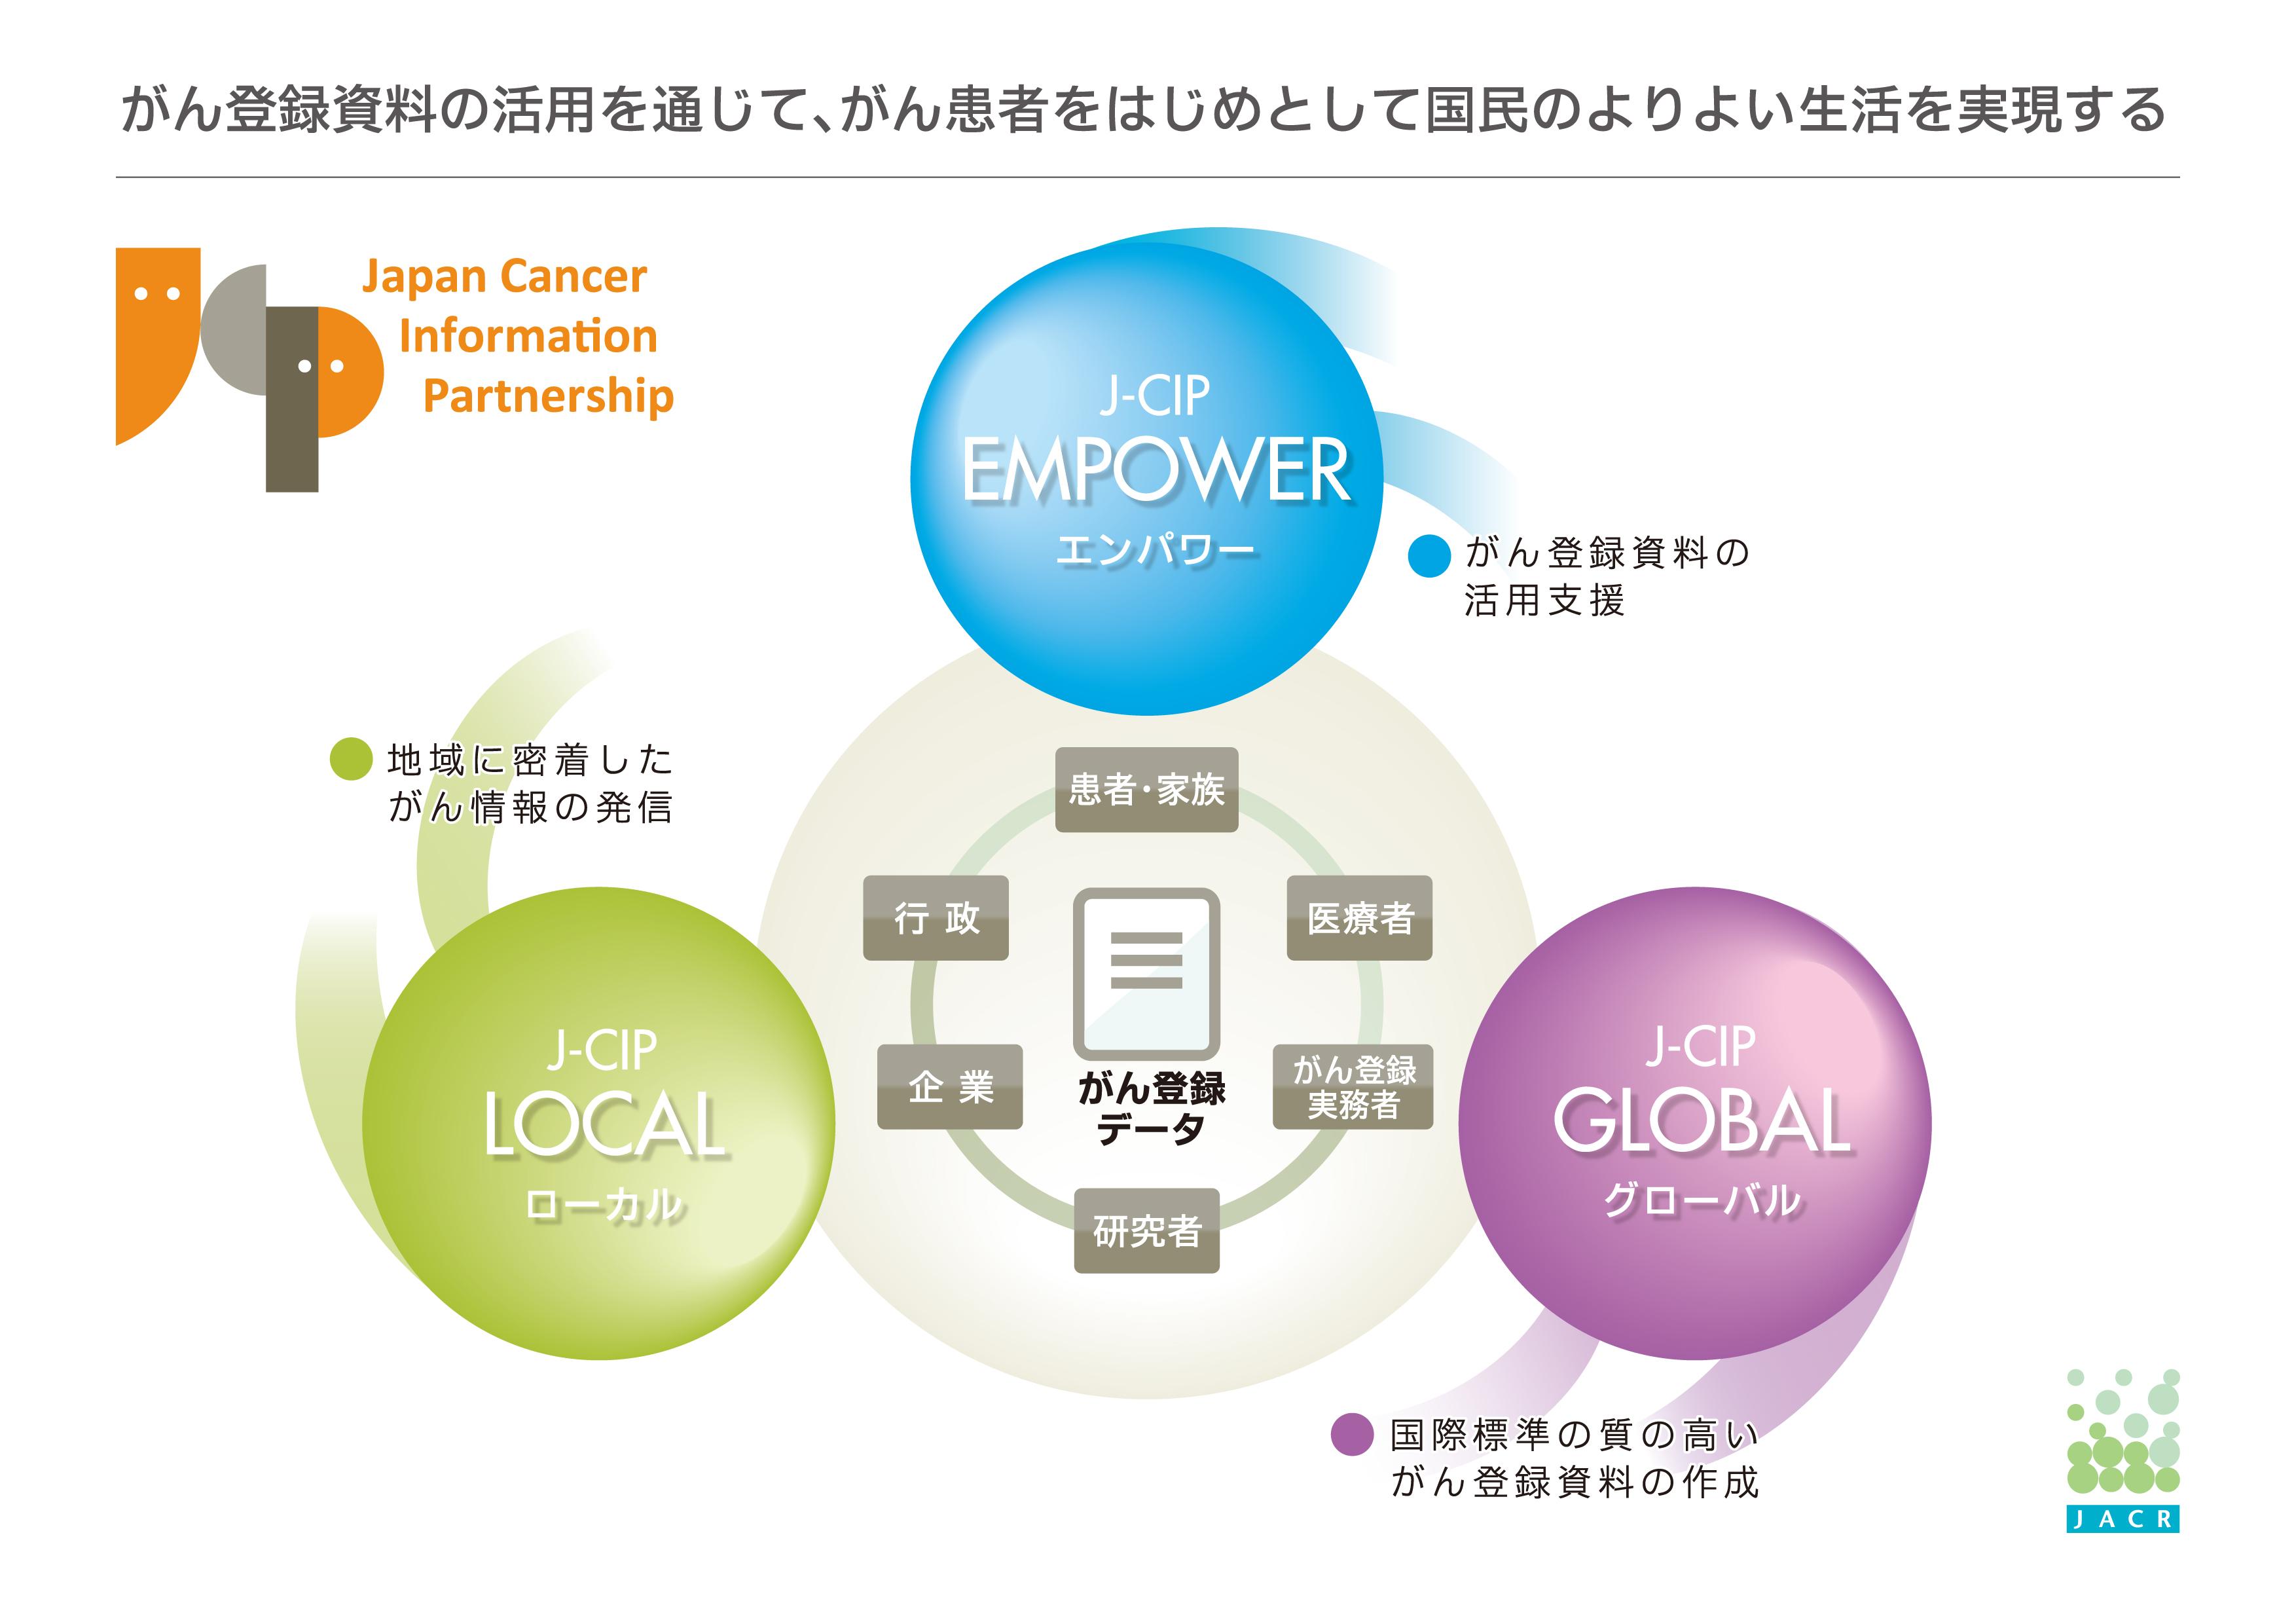 J-CIP概念図